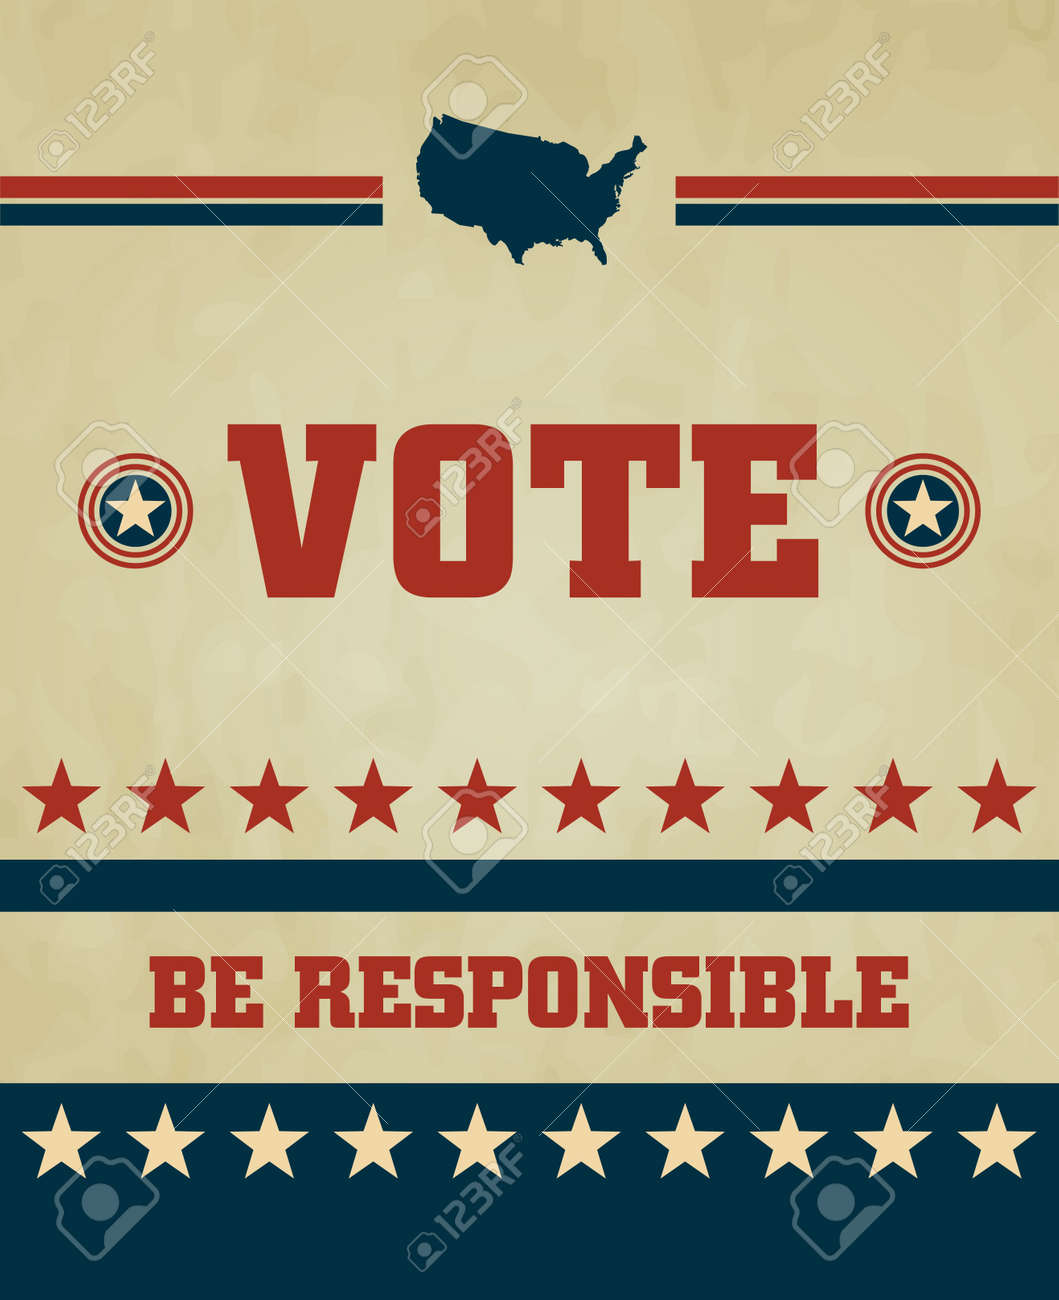 Voting Symbols design Stock Vector - 15157174